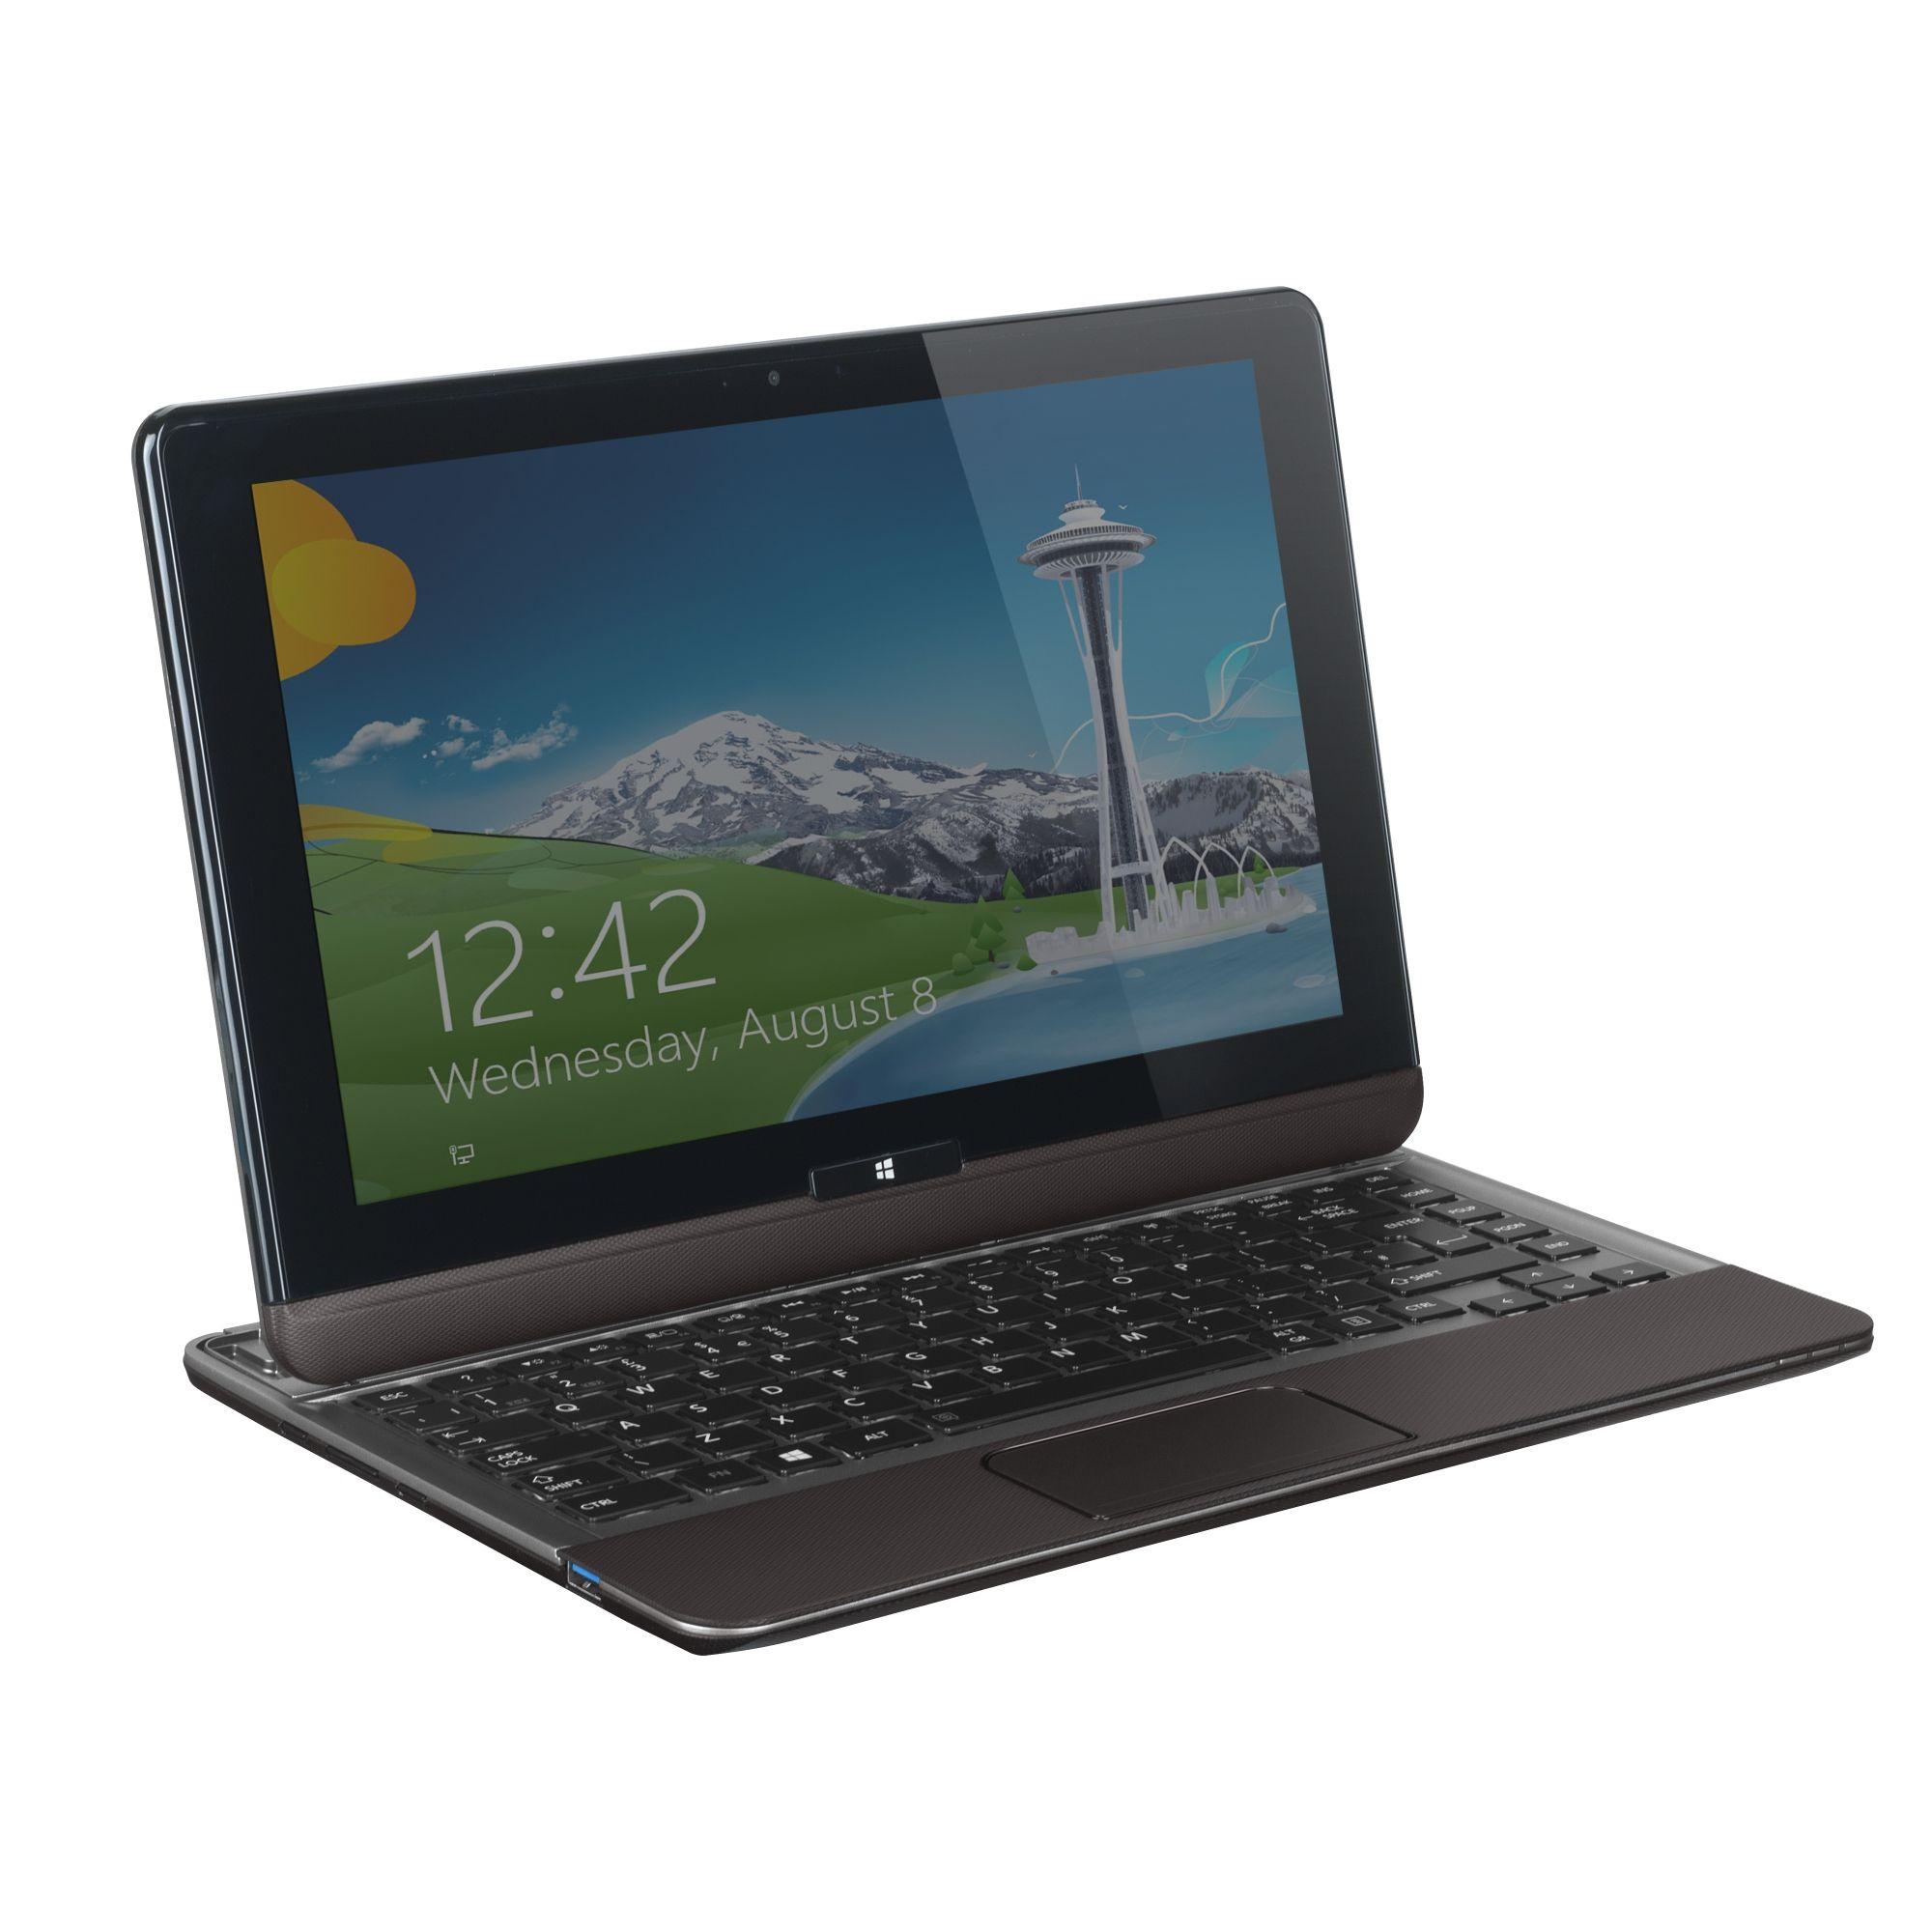 Toshiba Satellite U920T-108 (12.5 inch) Notebook Core i3 (3217U) 1.8GHz 4GB 128GB SSD WLAN BT Webcam Windows 8 64-bit (Intel HD Graphics 4000) at Tesco Direct